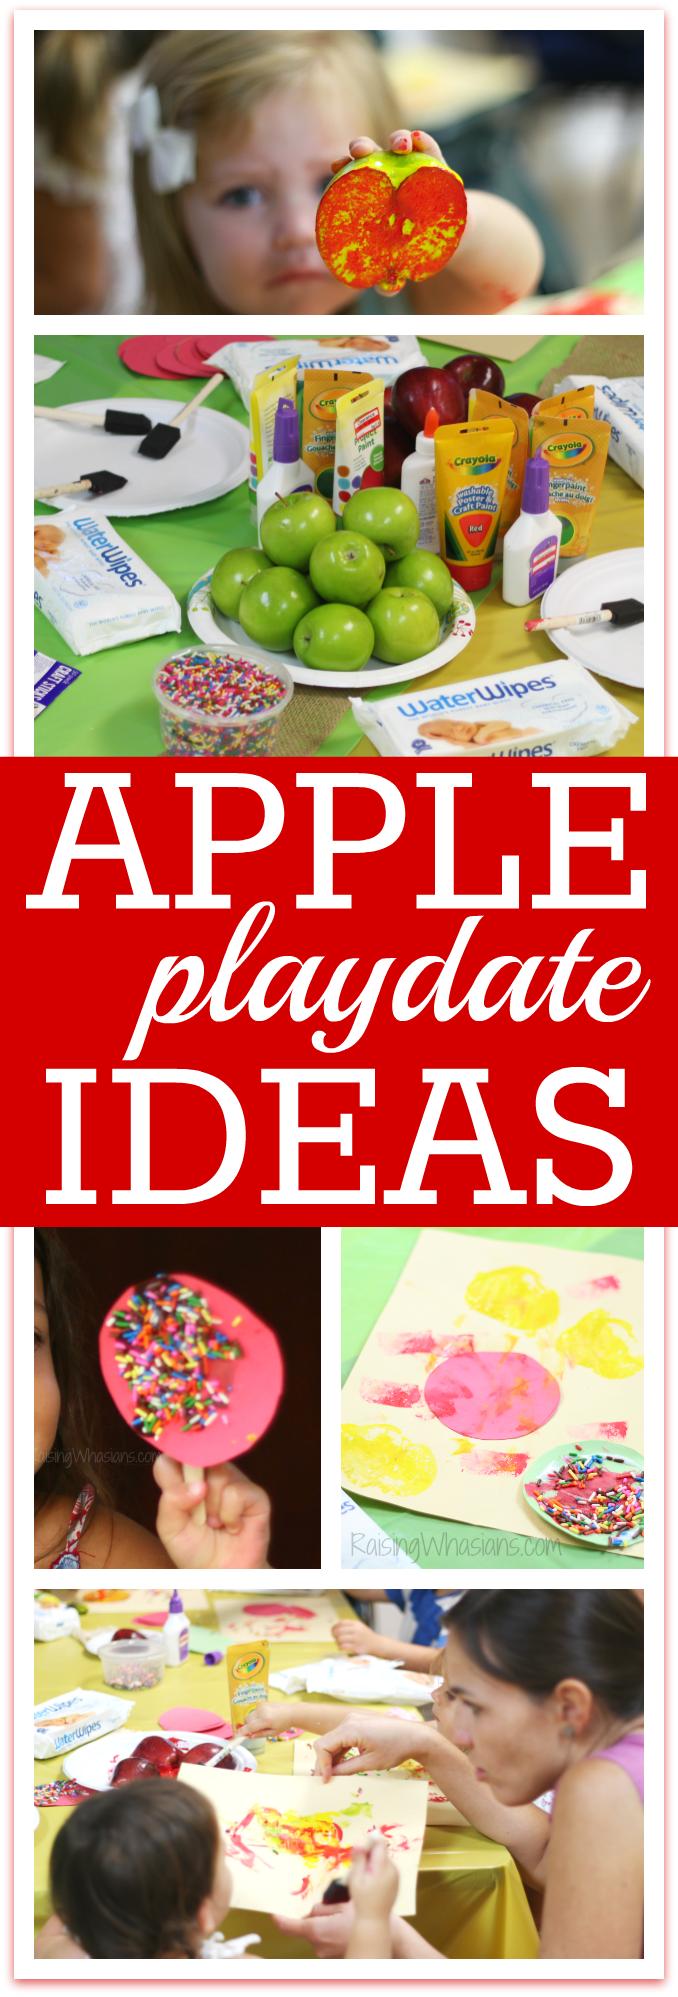 Apple playdate ideas for preschoolers